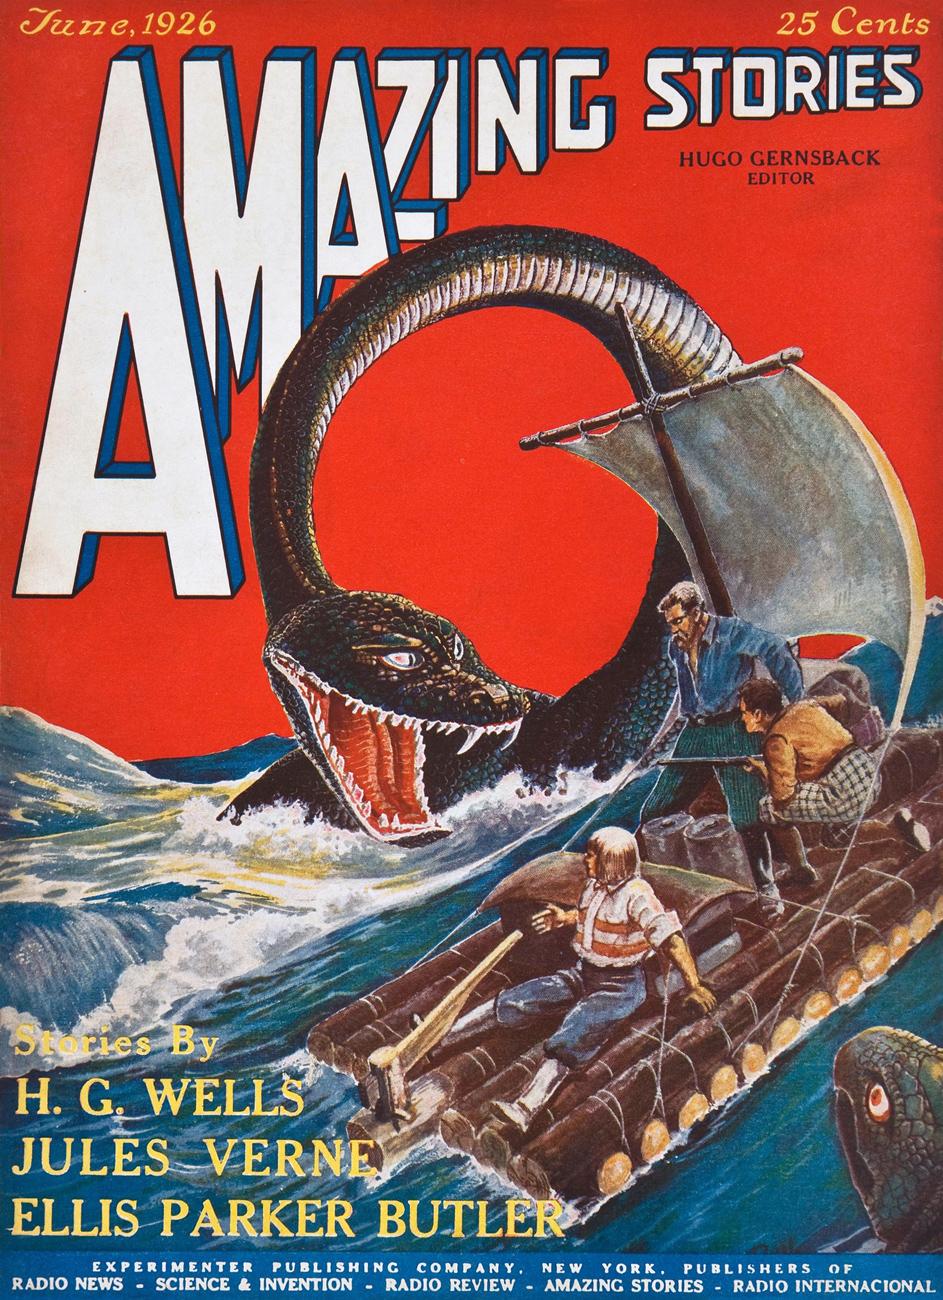 AmazingStoriesJune1926A